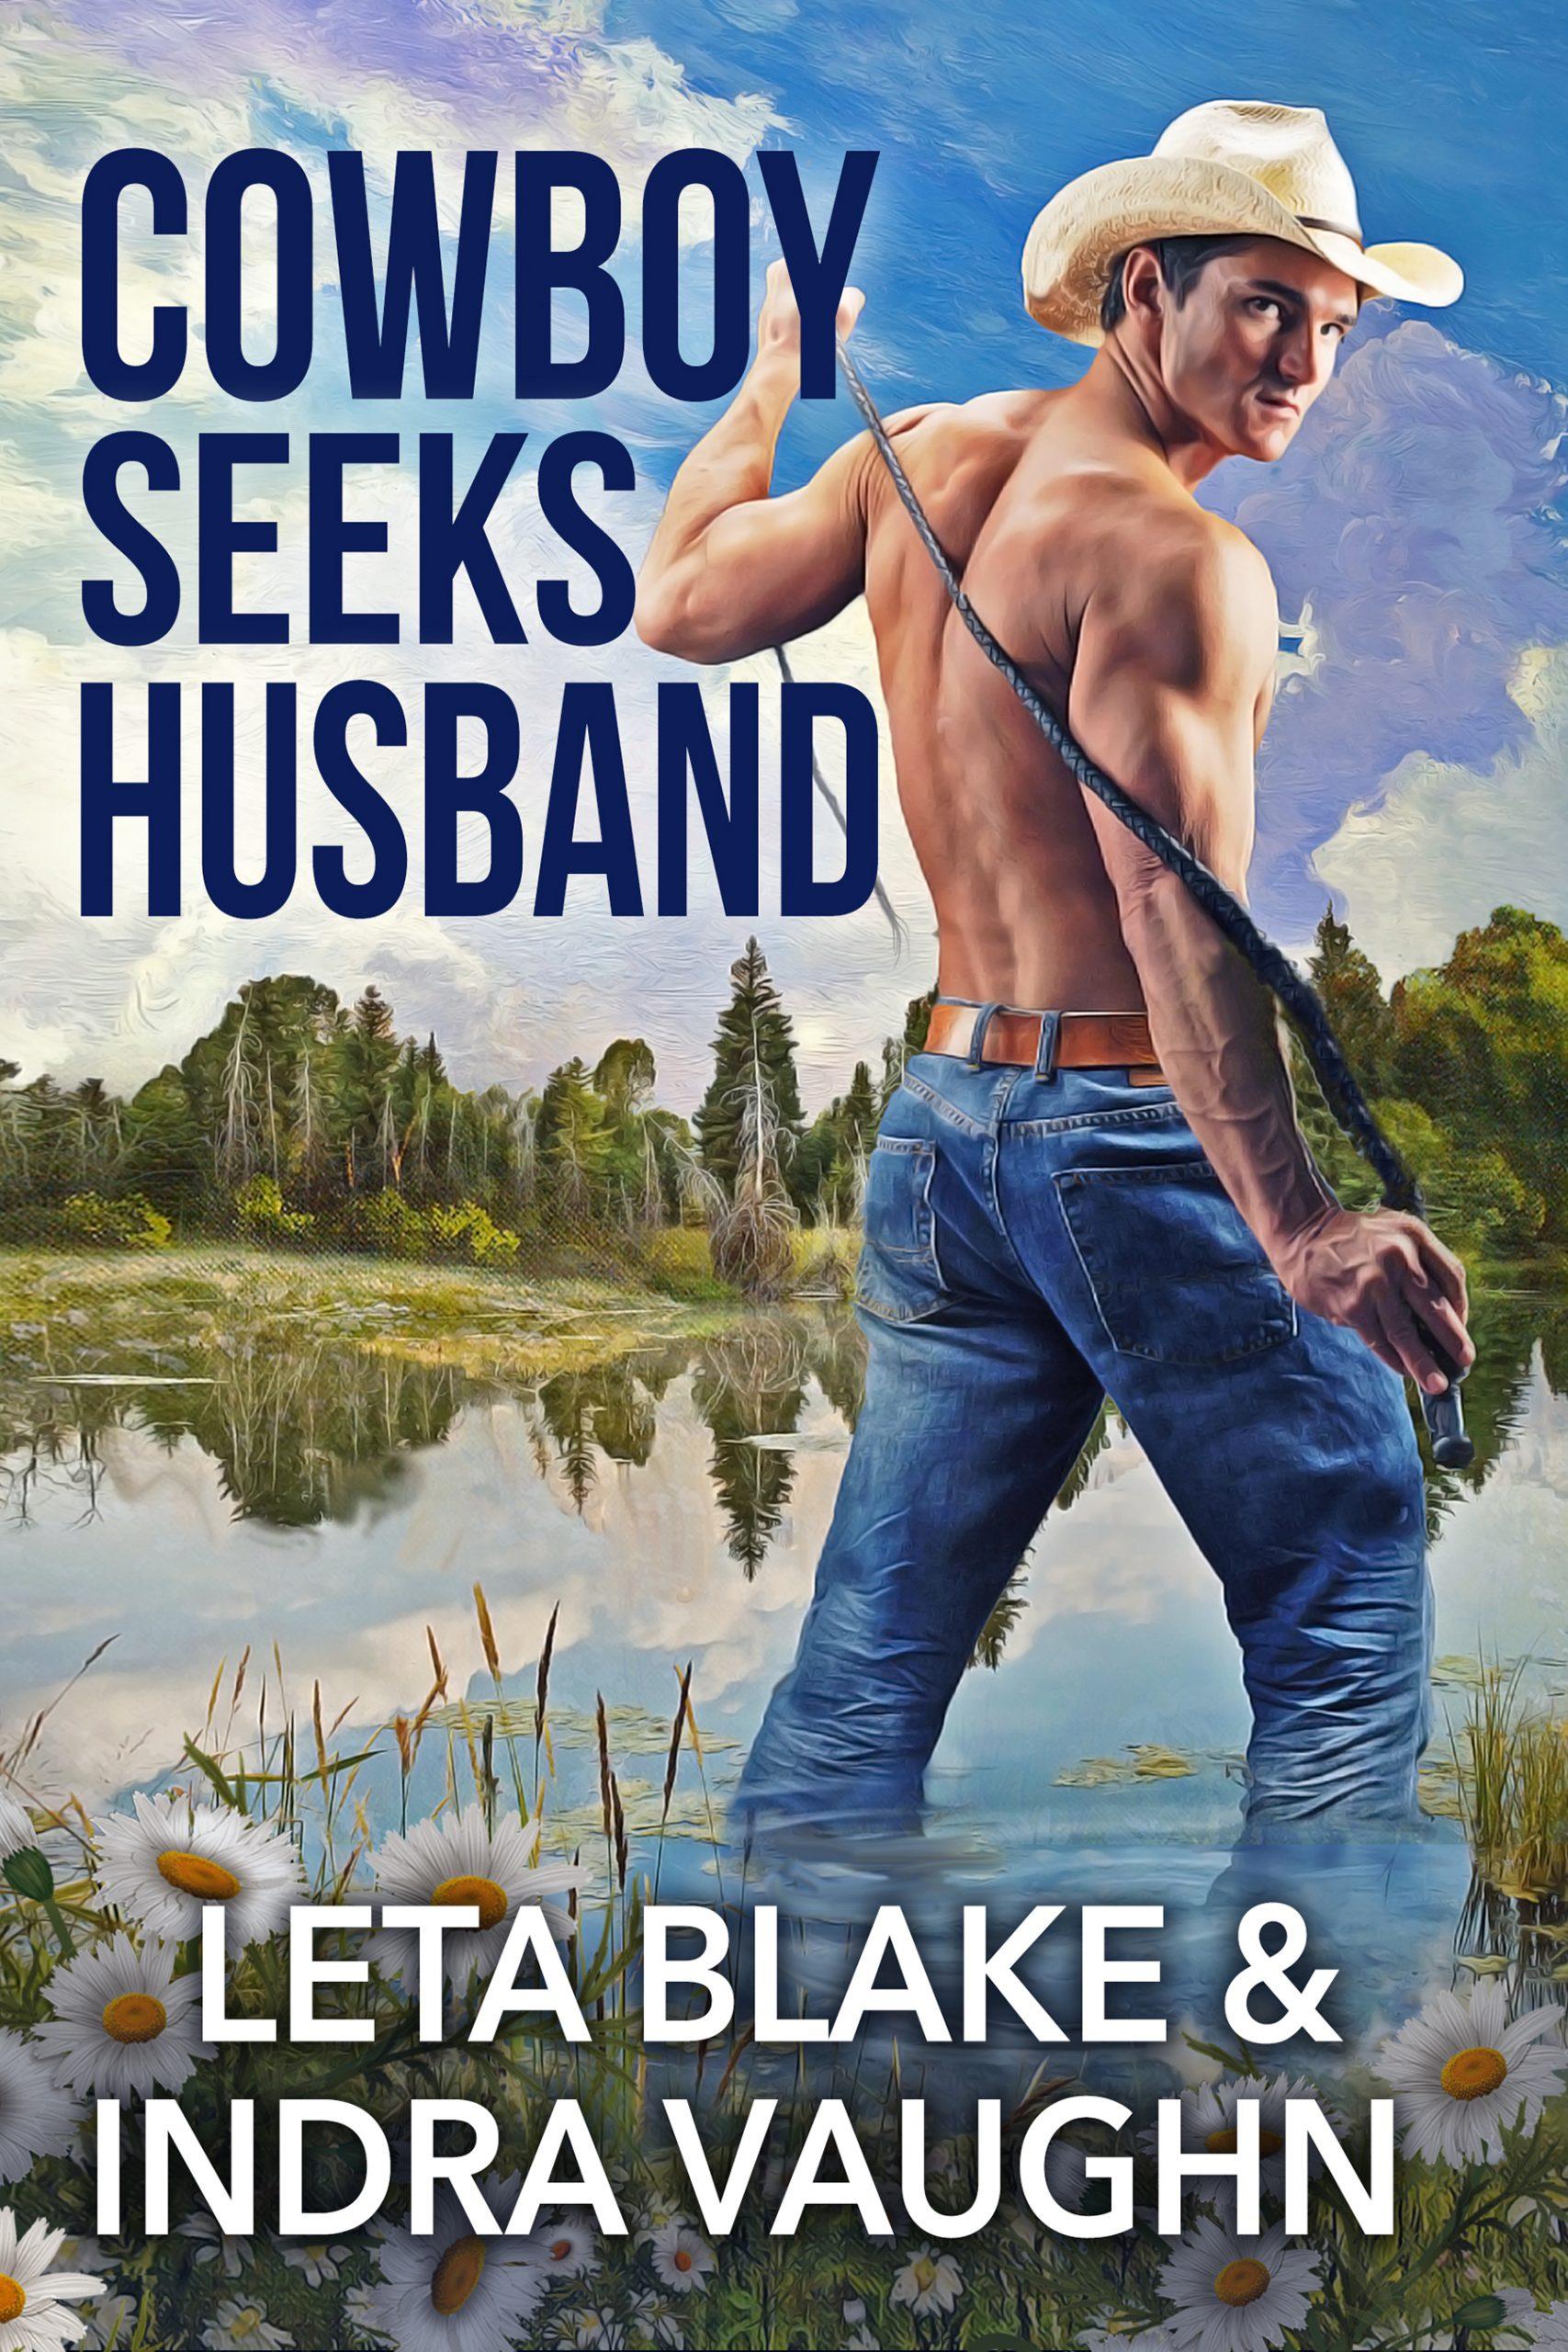 Cowboy Seeks Husband by Leta Blake & Indra Vaughn